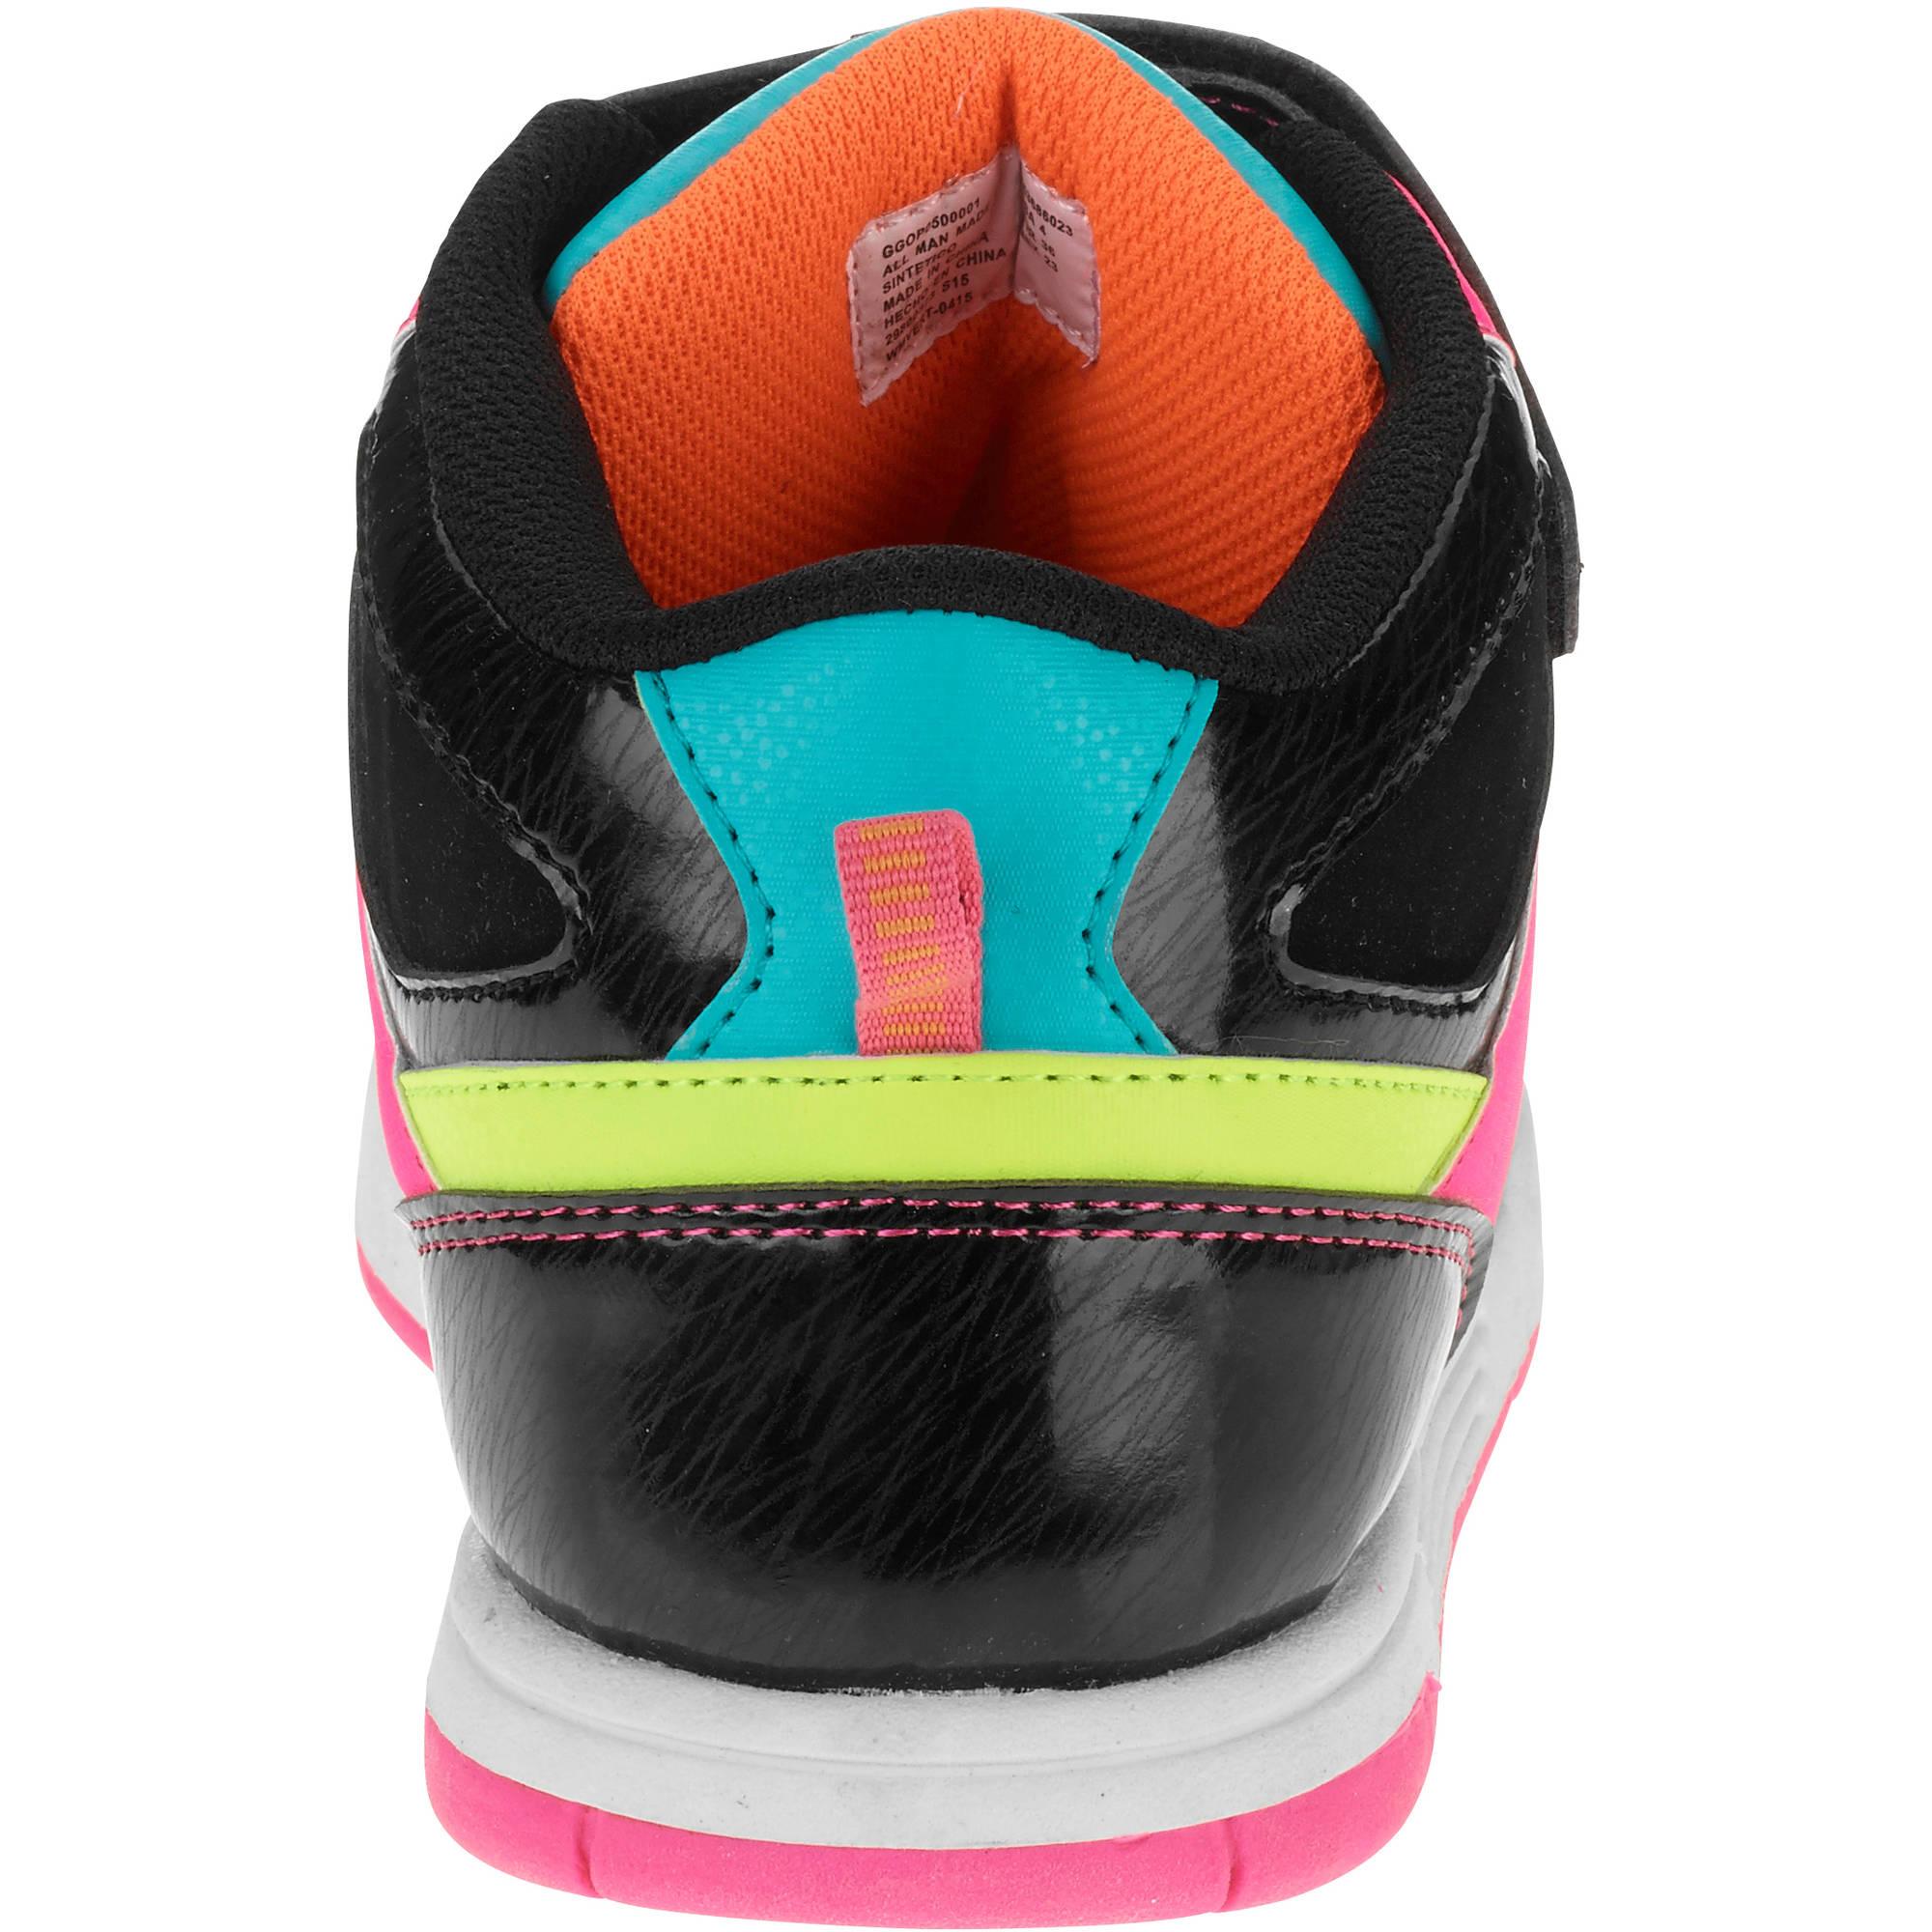 OP - OP Girl s Athletic Skate Sneaker - Walmart.com 65c341f9e